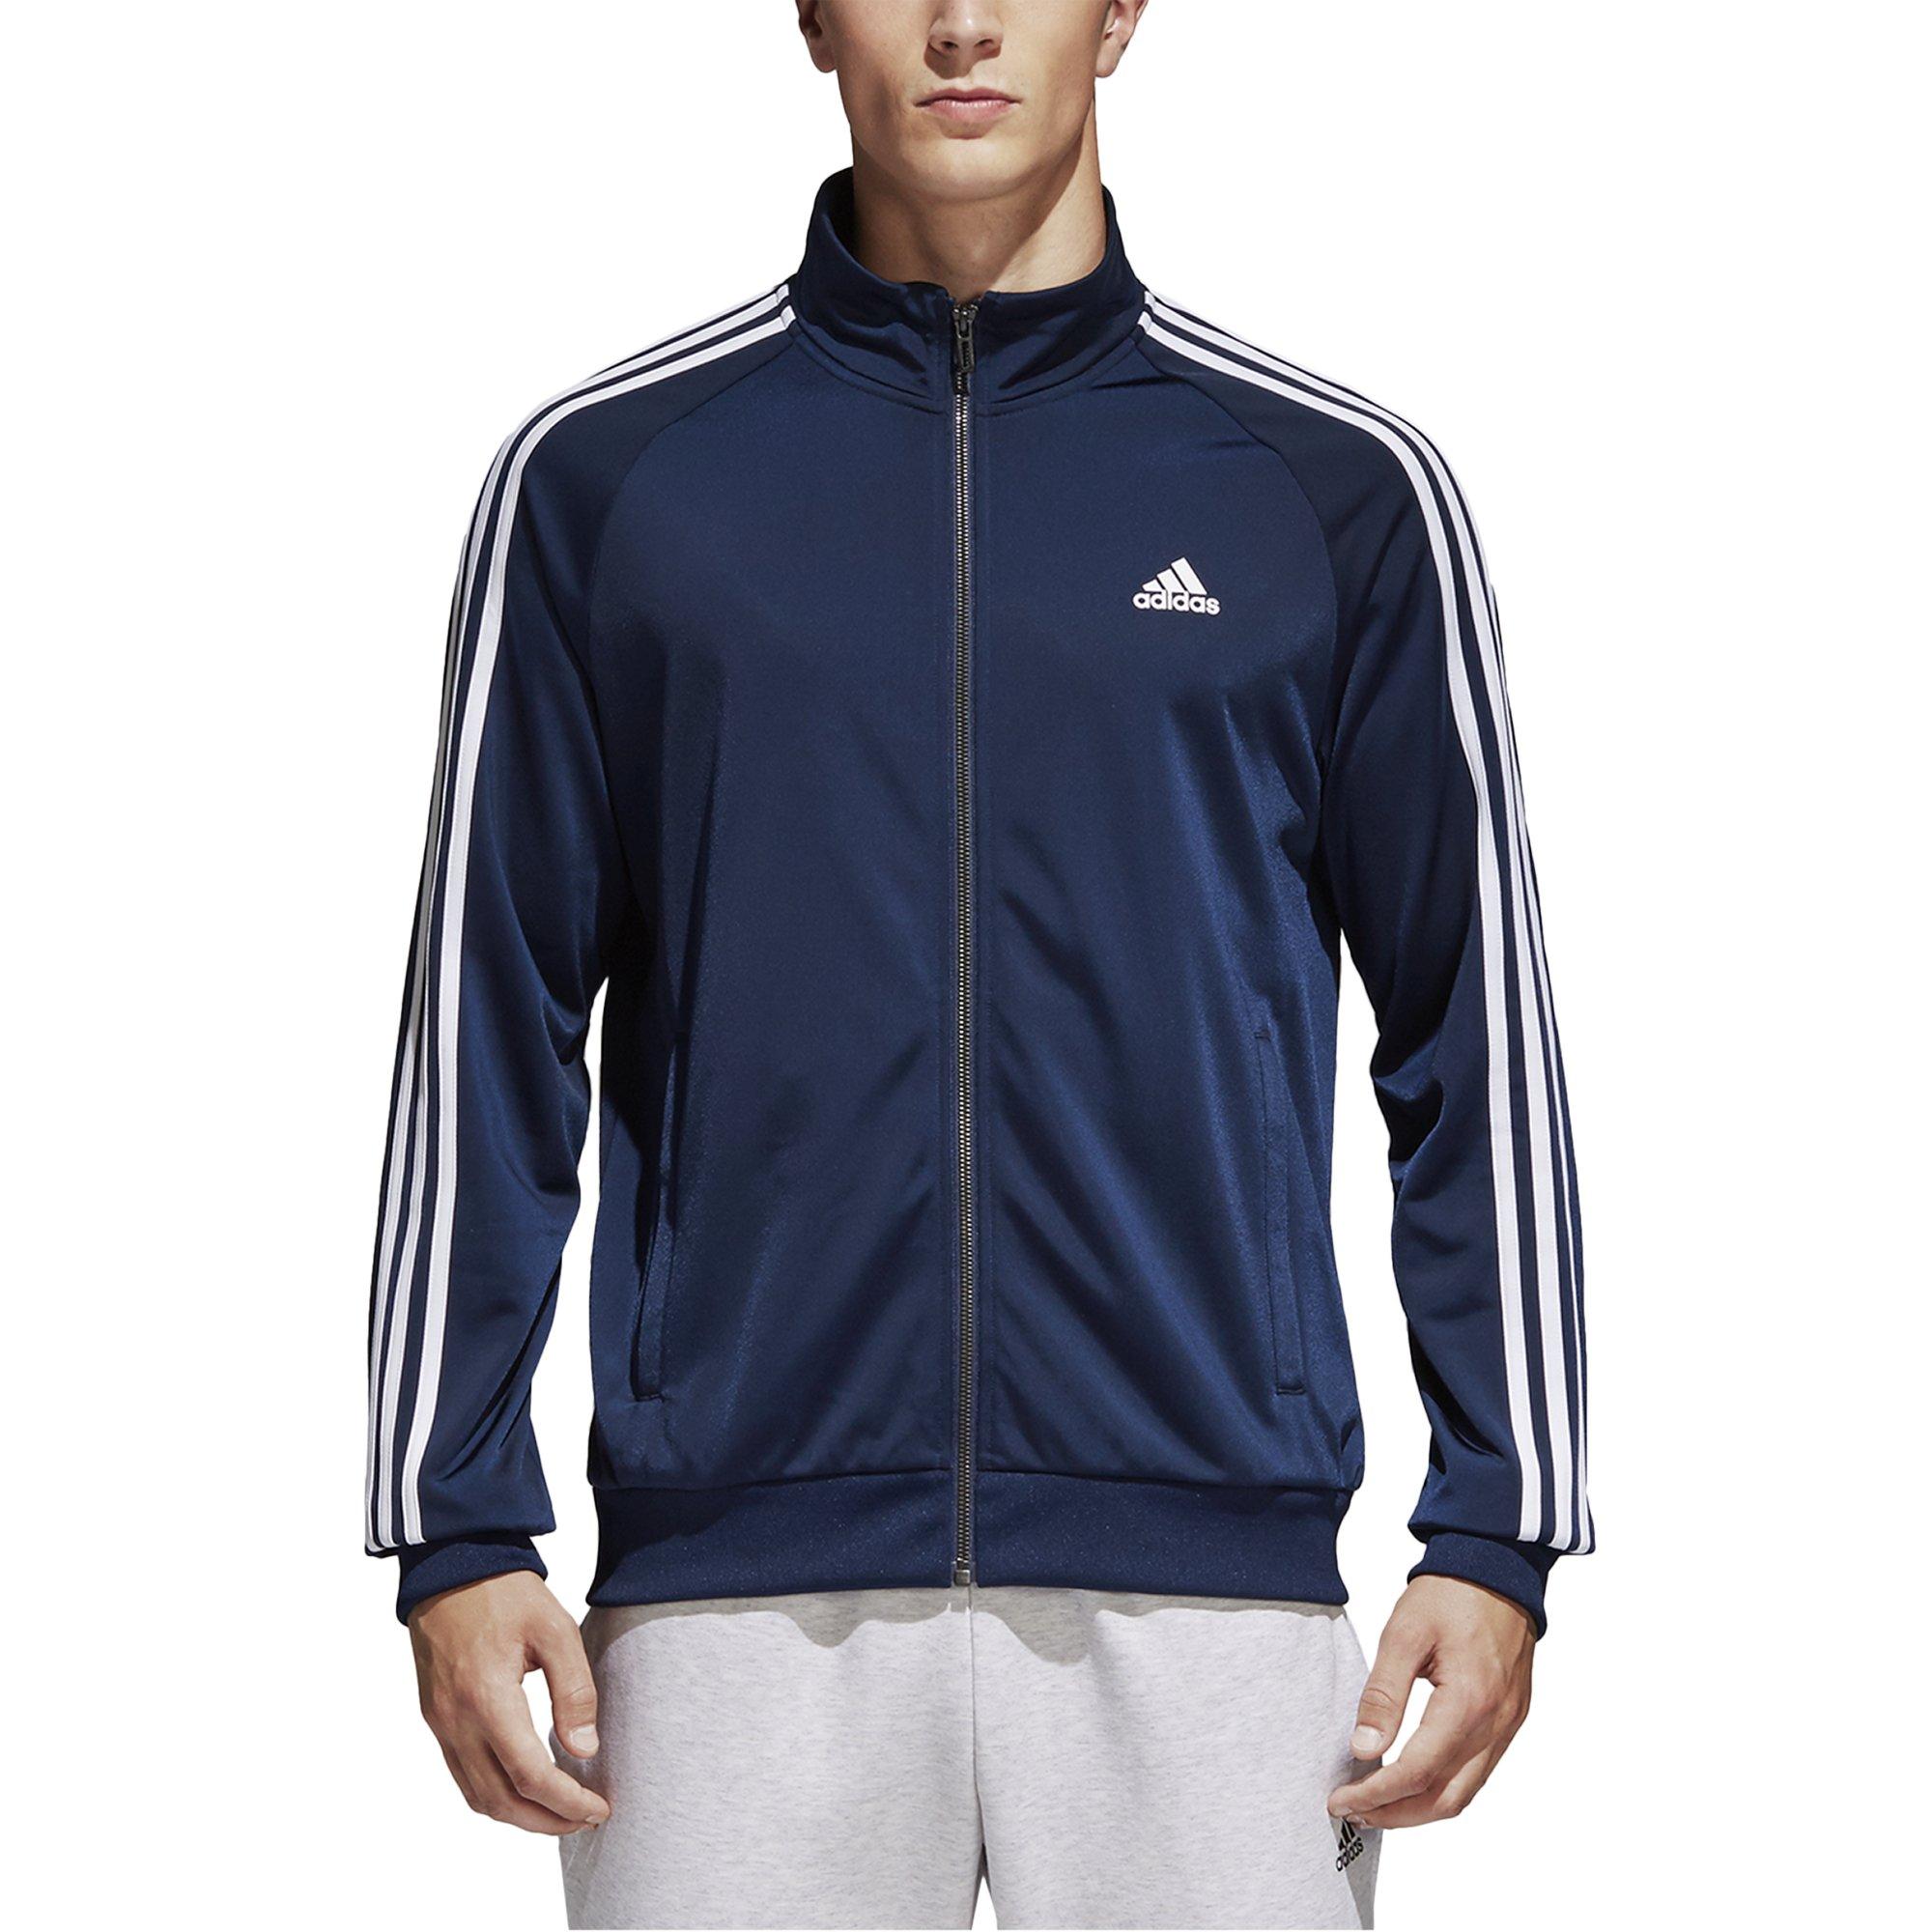 adidas Men's Essentials 3-Stripe Tricot Track Jacket, Collegiate Navy/White, Medium by adidas (Image #7)